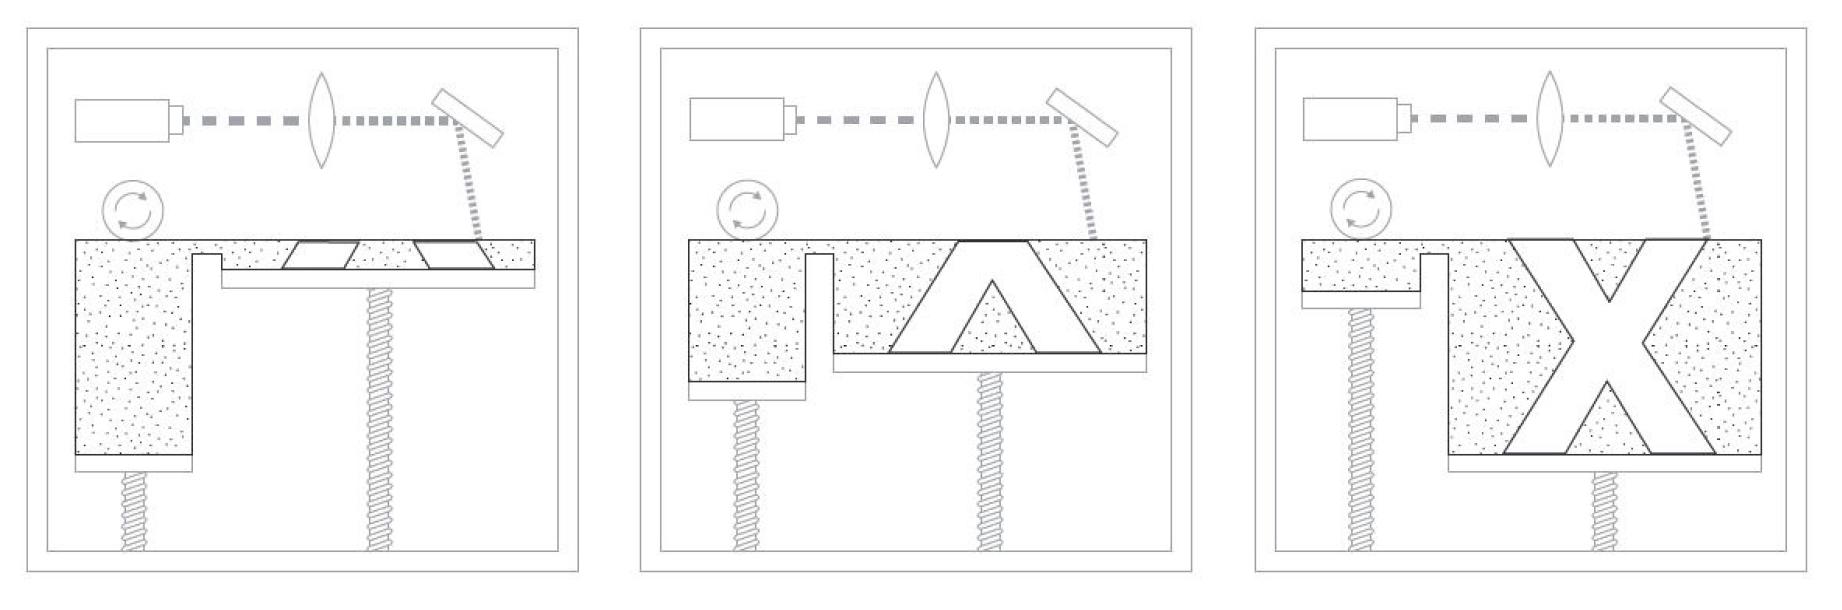 SLS (Selective Laser Sintering)